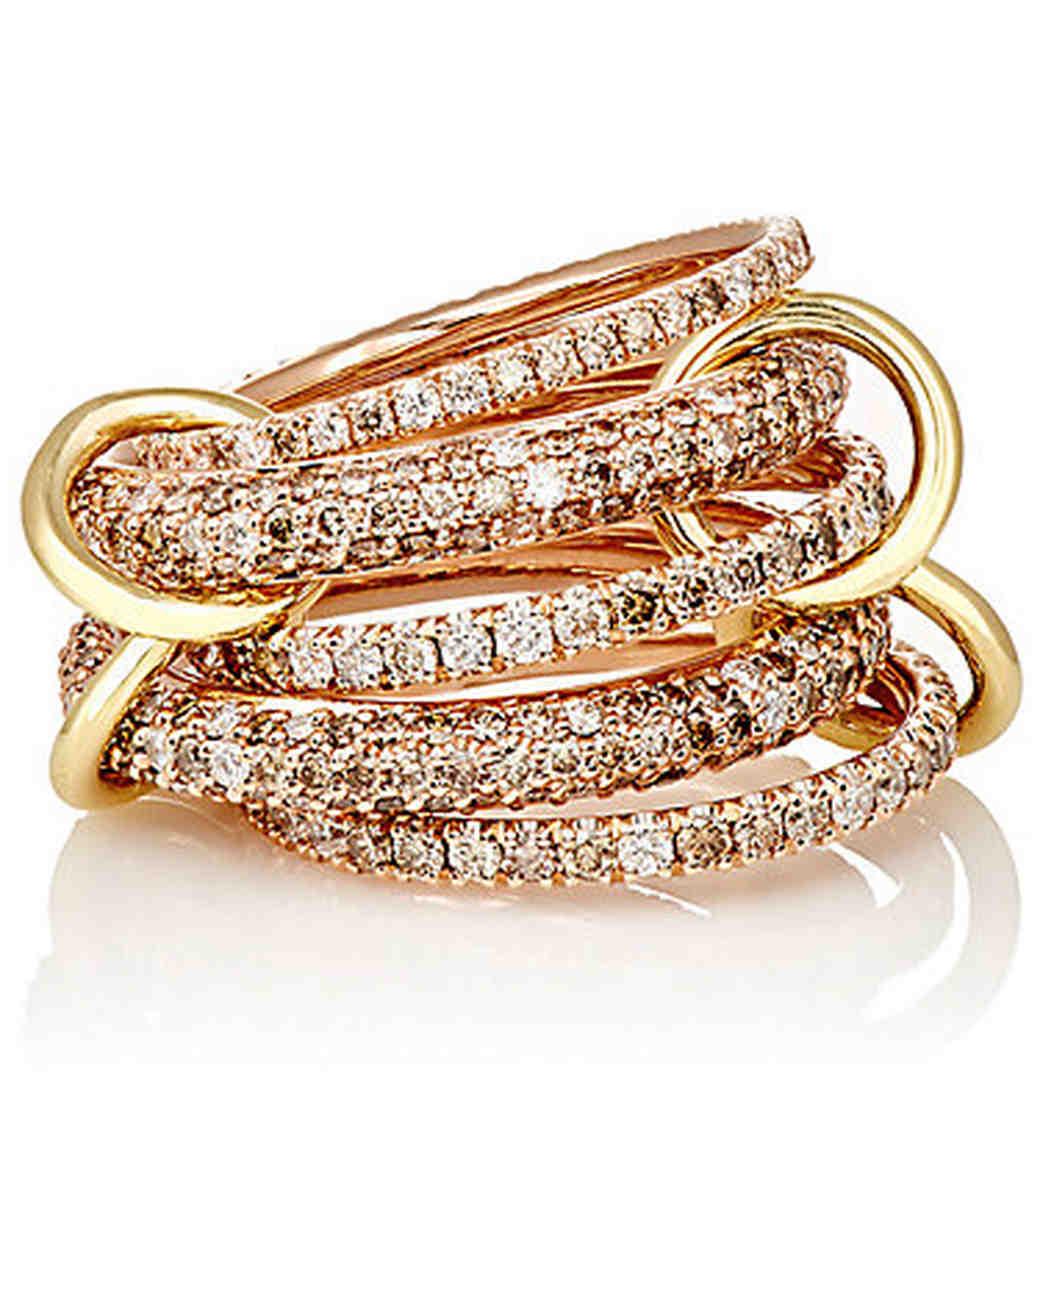 unique stackable wedding rings stackable wedding bands Unique stackable wedding rings Unique Stackable Wedding Rings 49